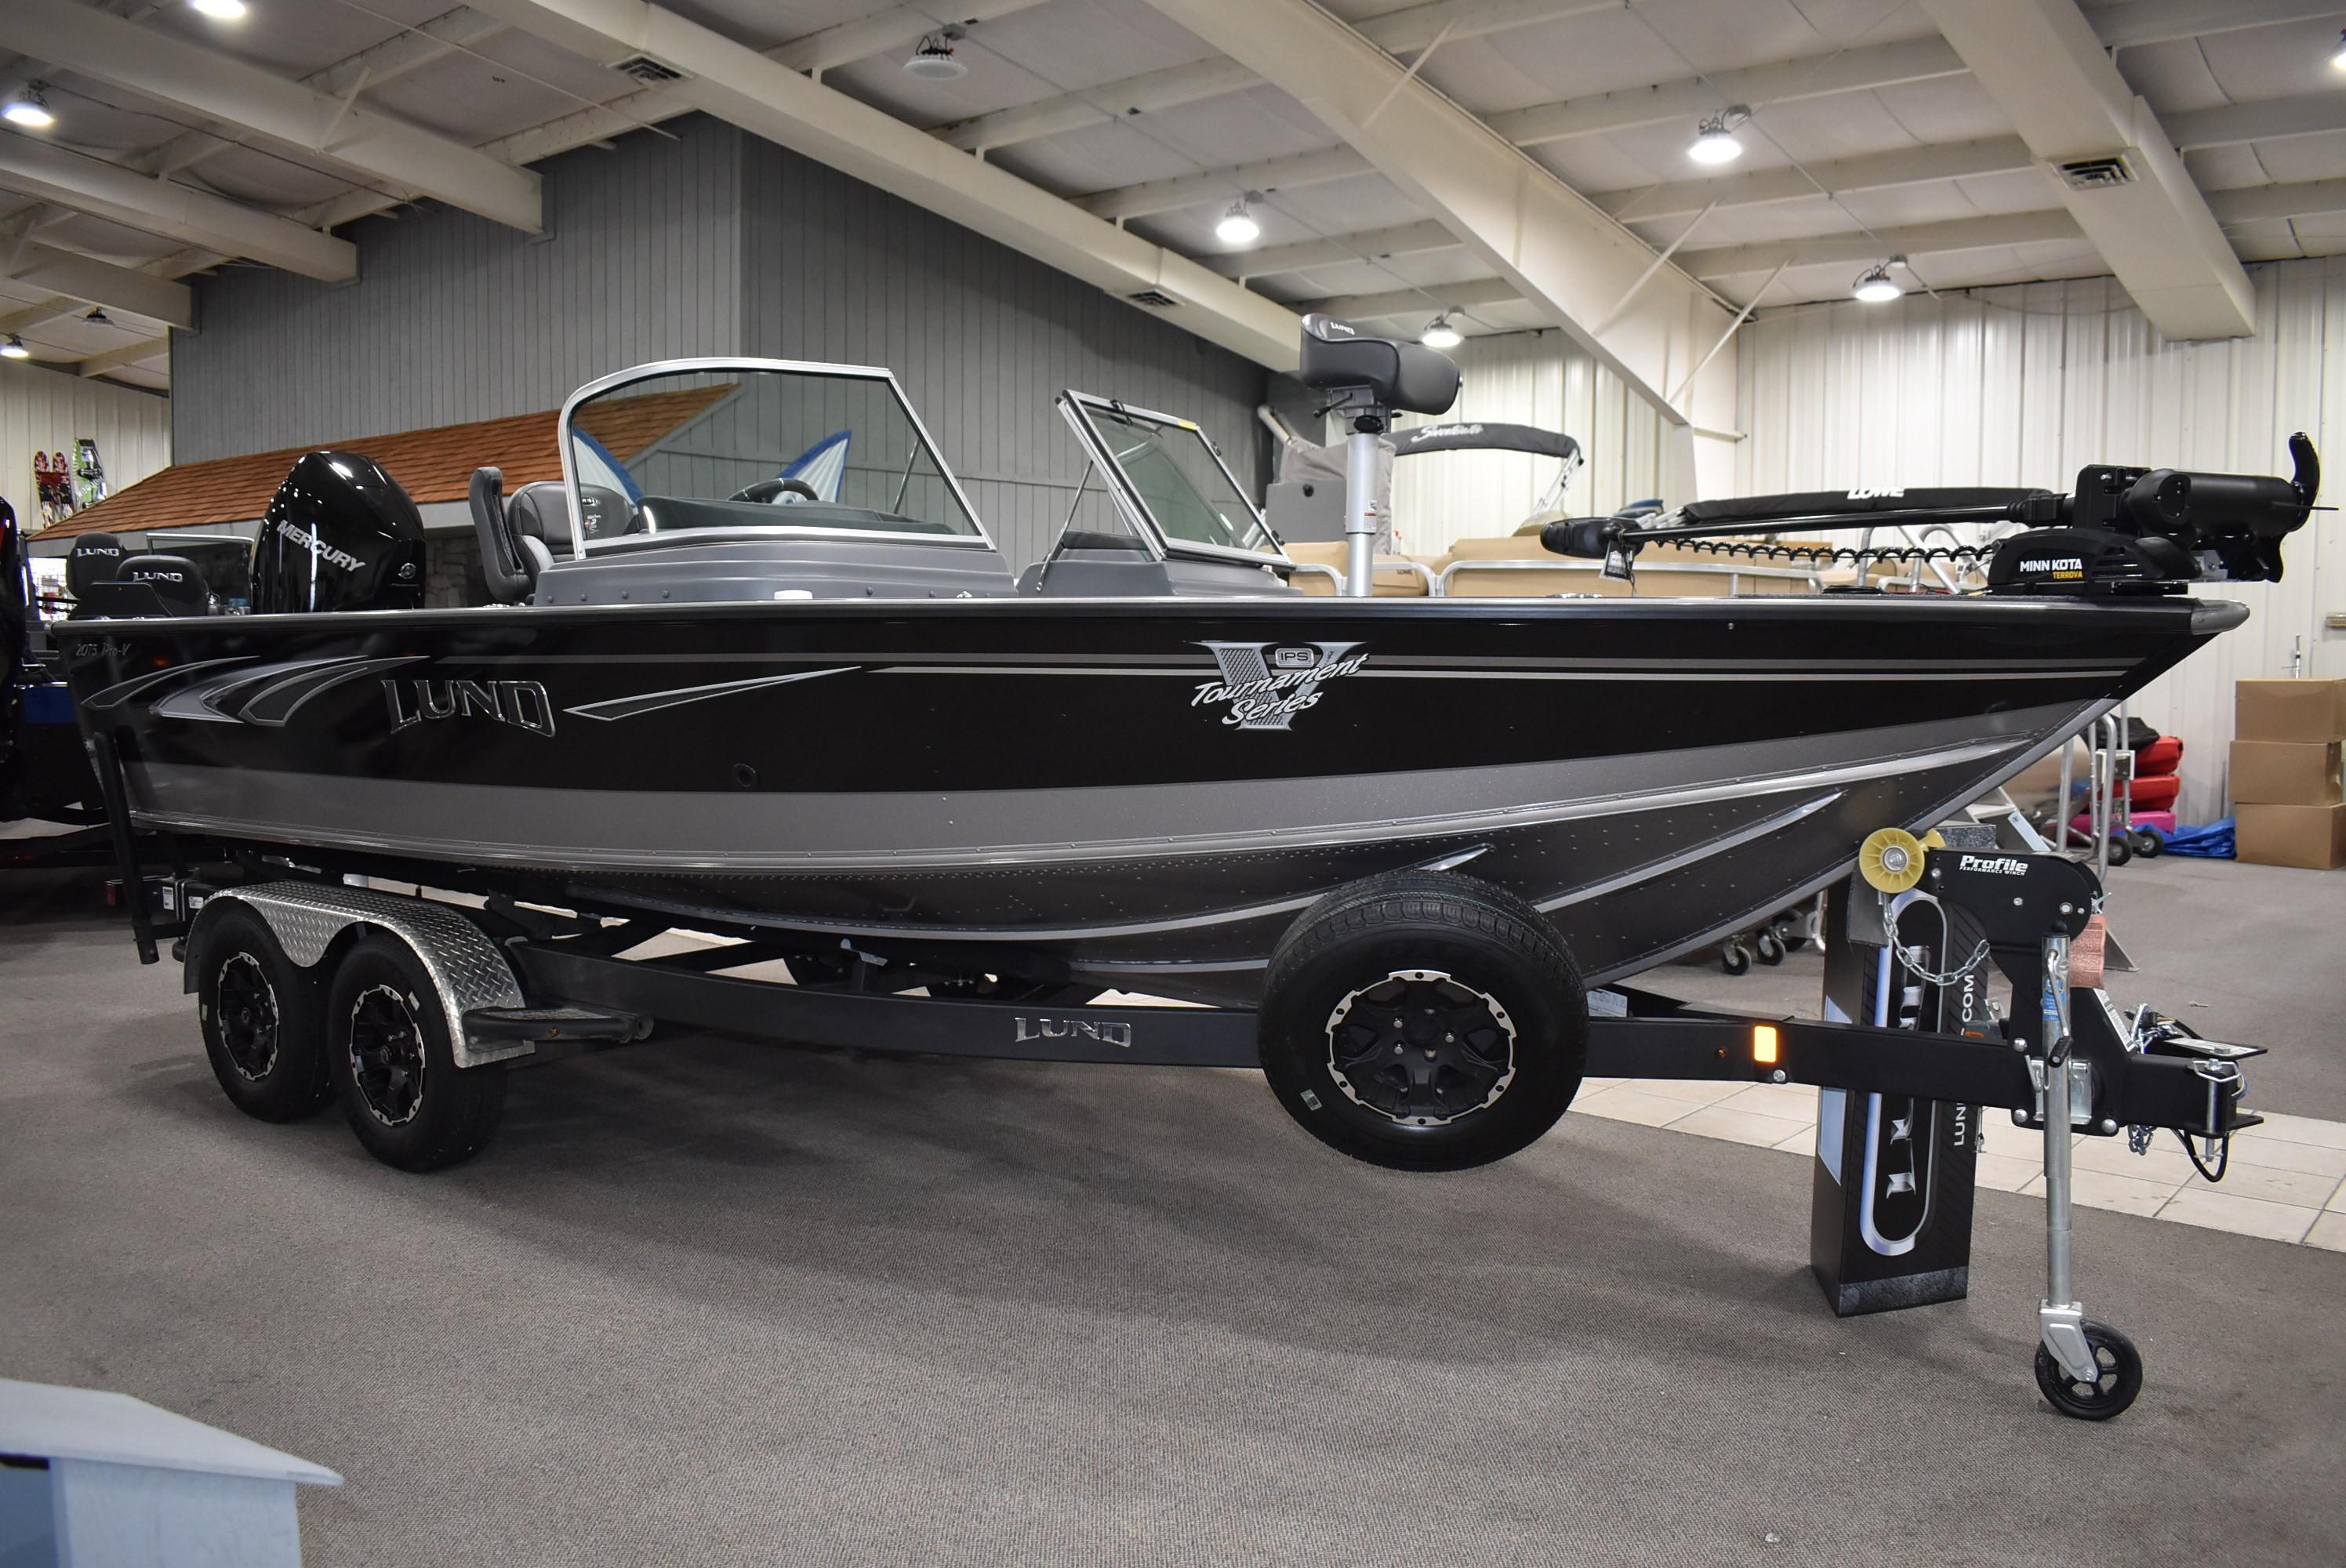 2019 Lund 2075 Pro V Smithville, Missouri - Smithville Marine